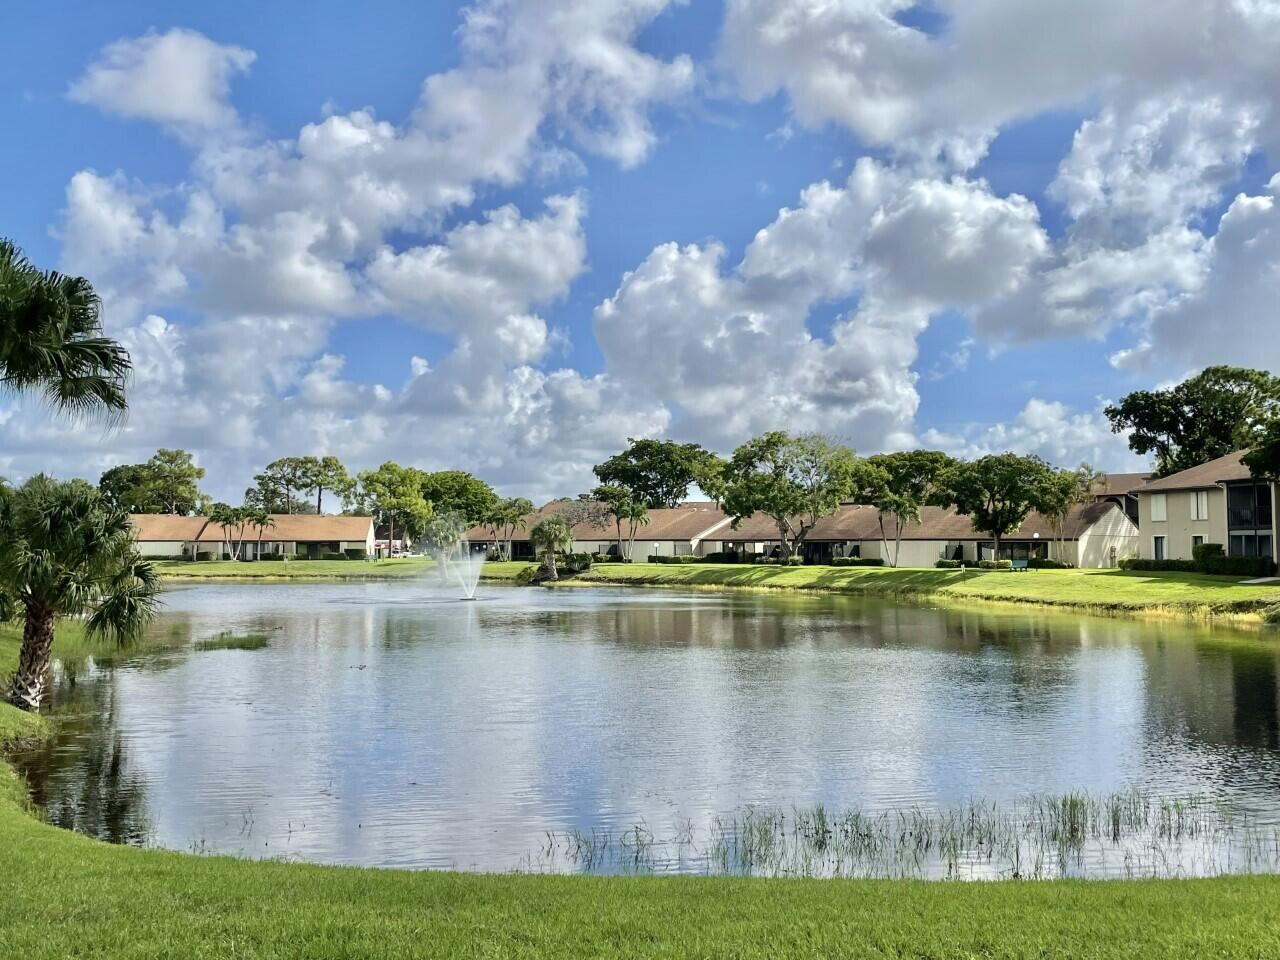 721 Sunny Pine Way #E1, Greenacres, FL 33415 - MLS#: RX-10733150